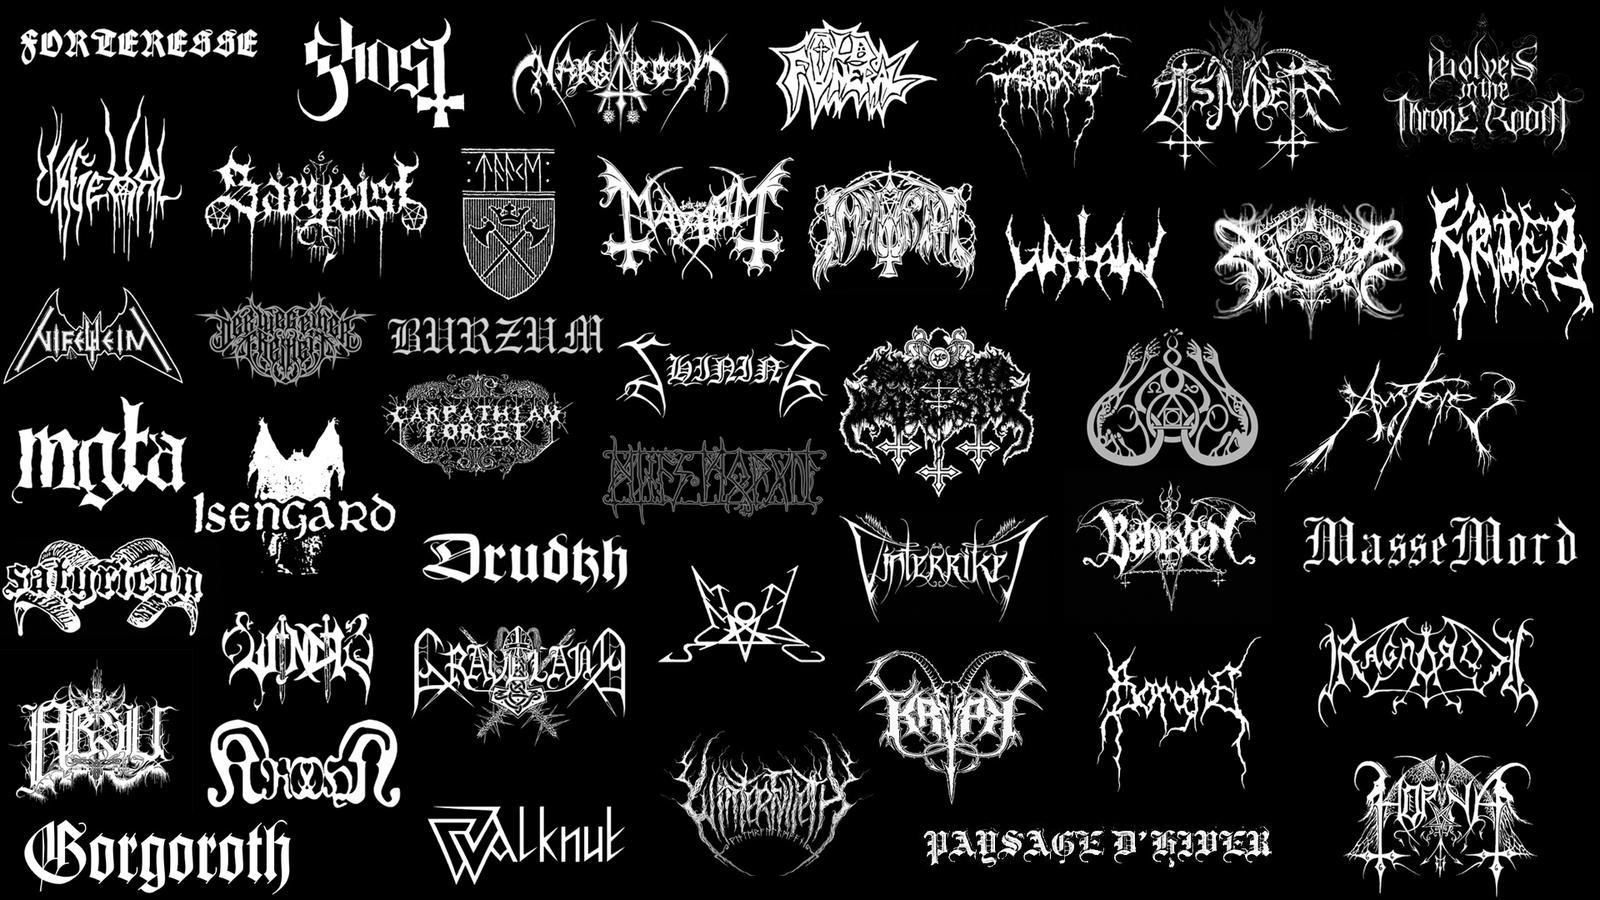 Black metal wallpaper by pggraphisme on deviantart - Black metal wallpaper ...